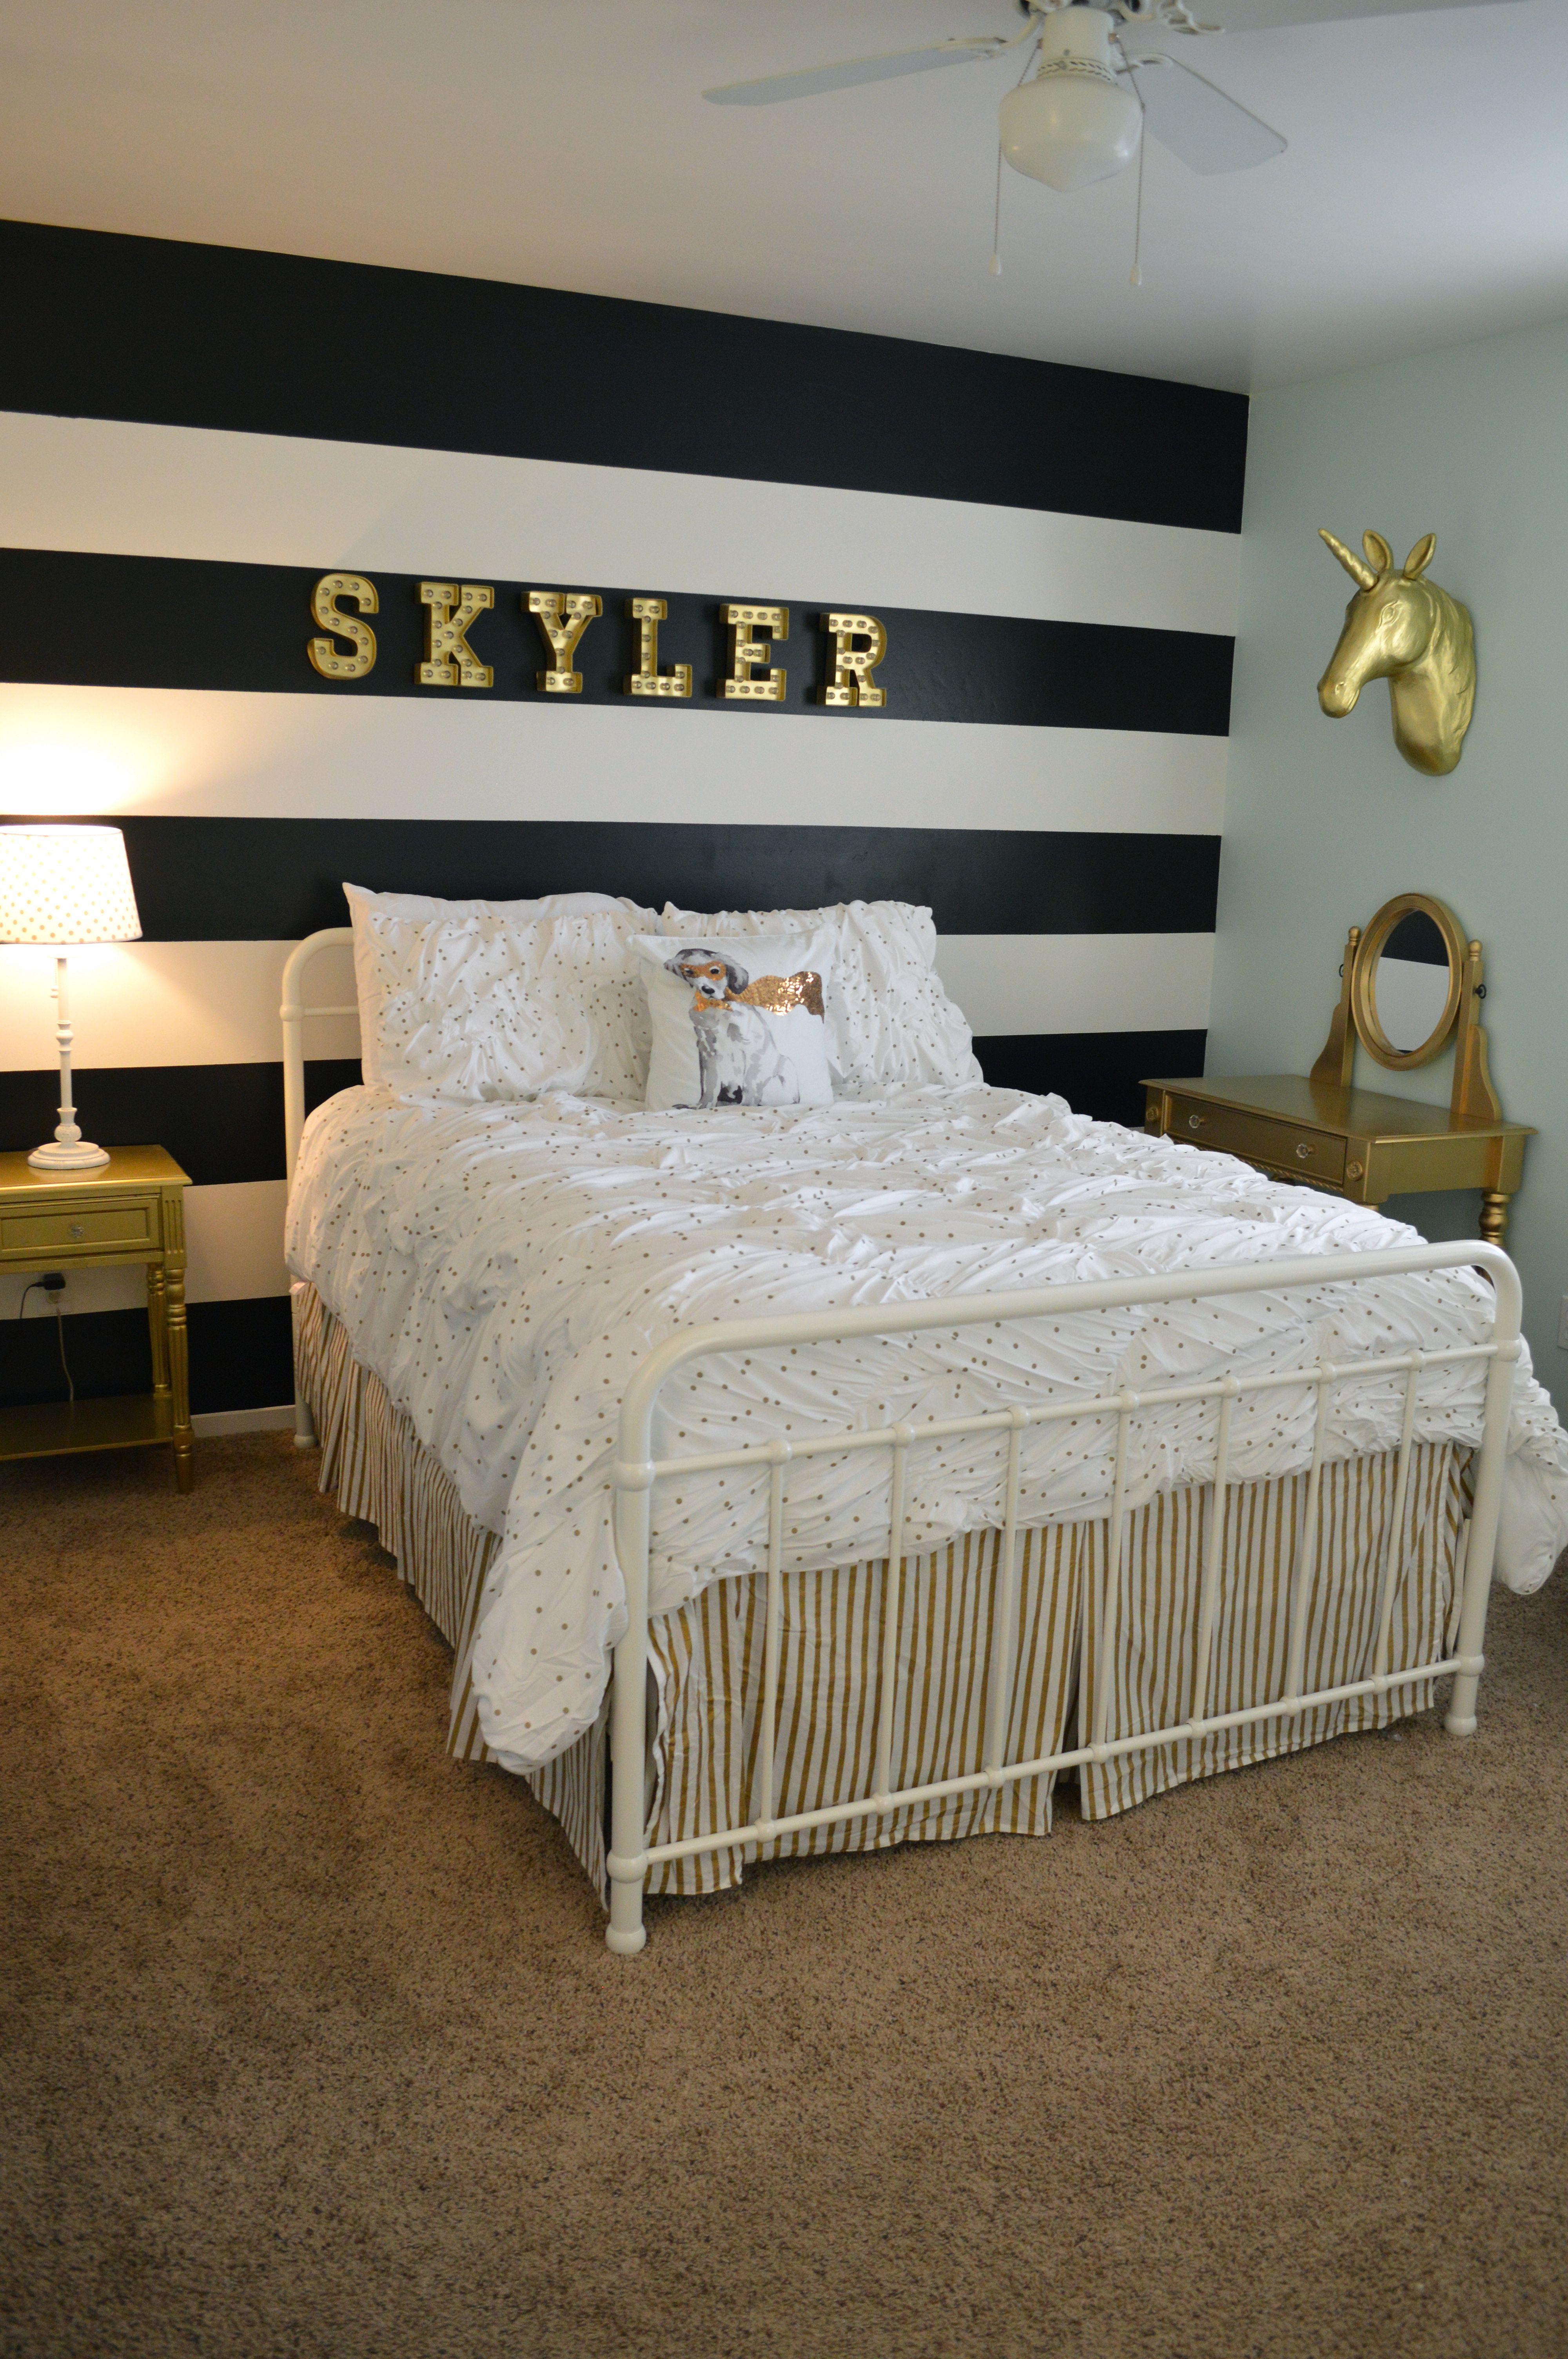 Beautiful Bedroom Wallpaper Decorating Ideas Black And White Stripes Room 4000x6016 Wallpaper Teahub Io